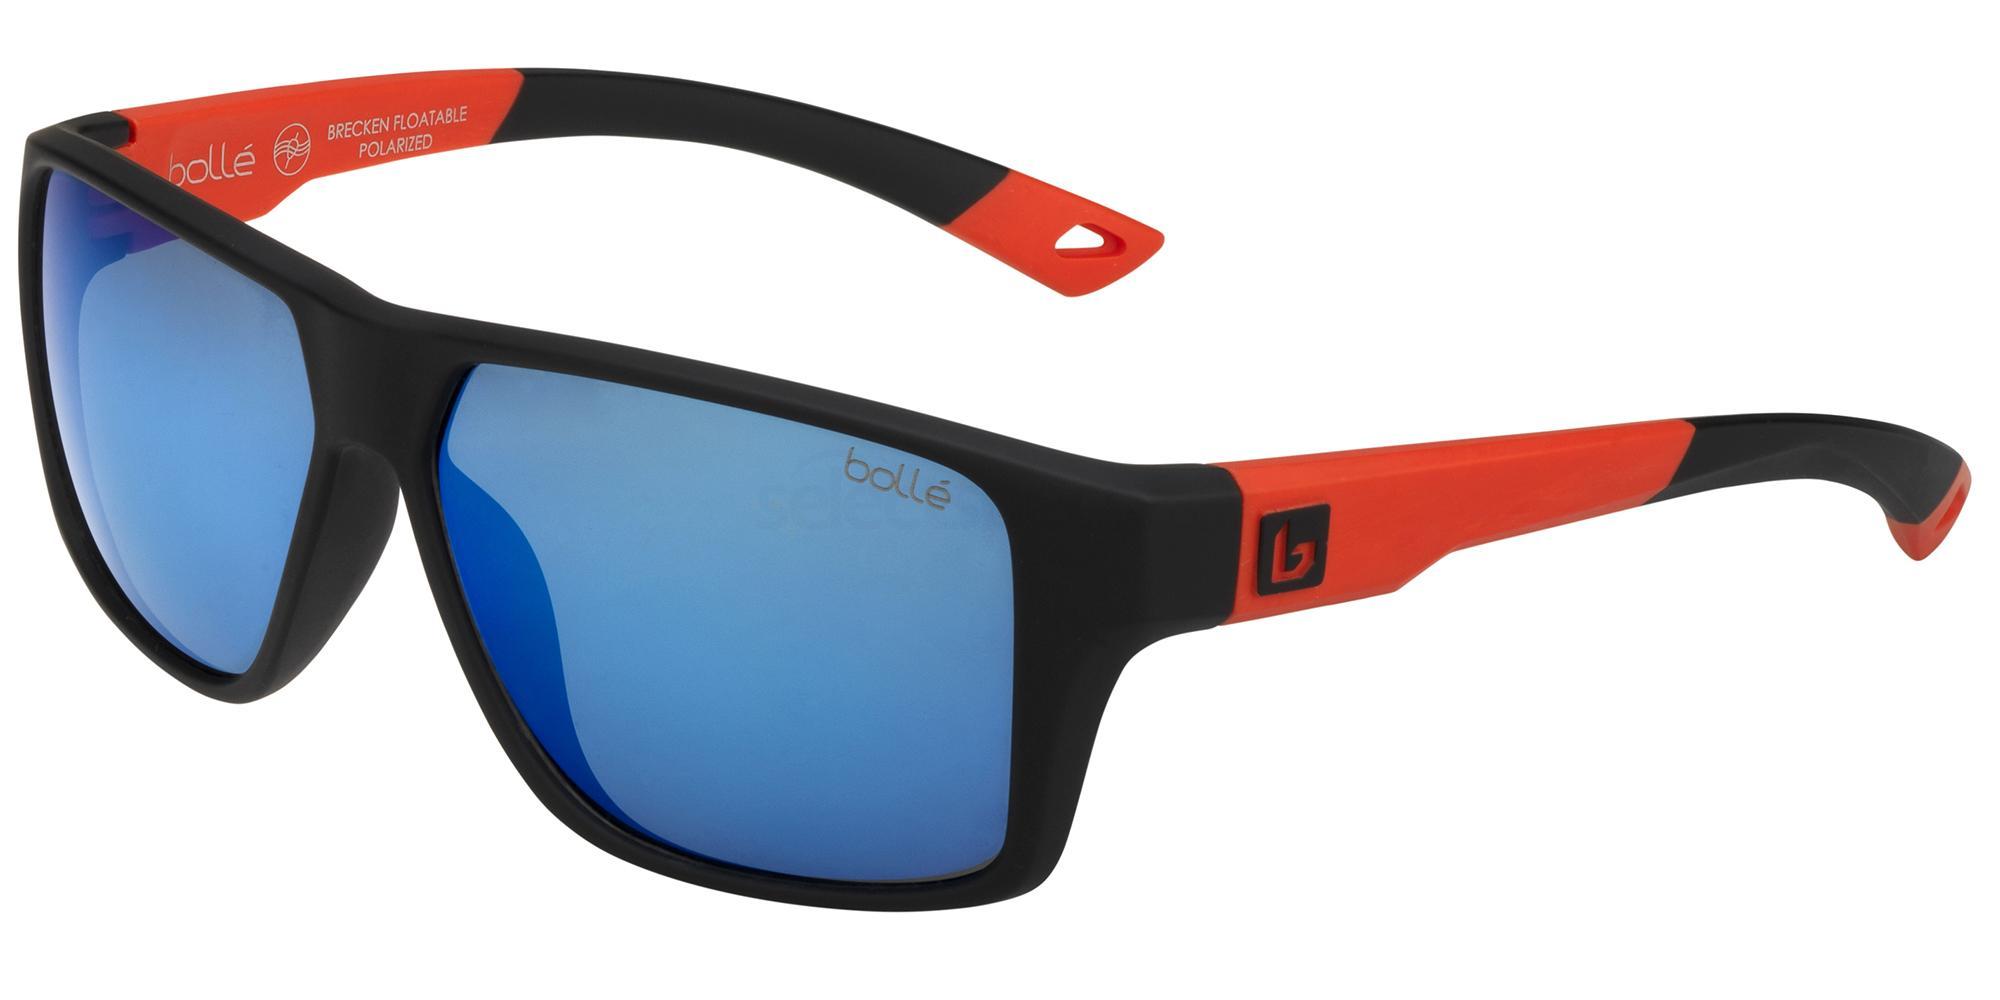 12459 BRECKEN FLOATABLE Sunglasses, Bolle